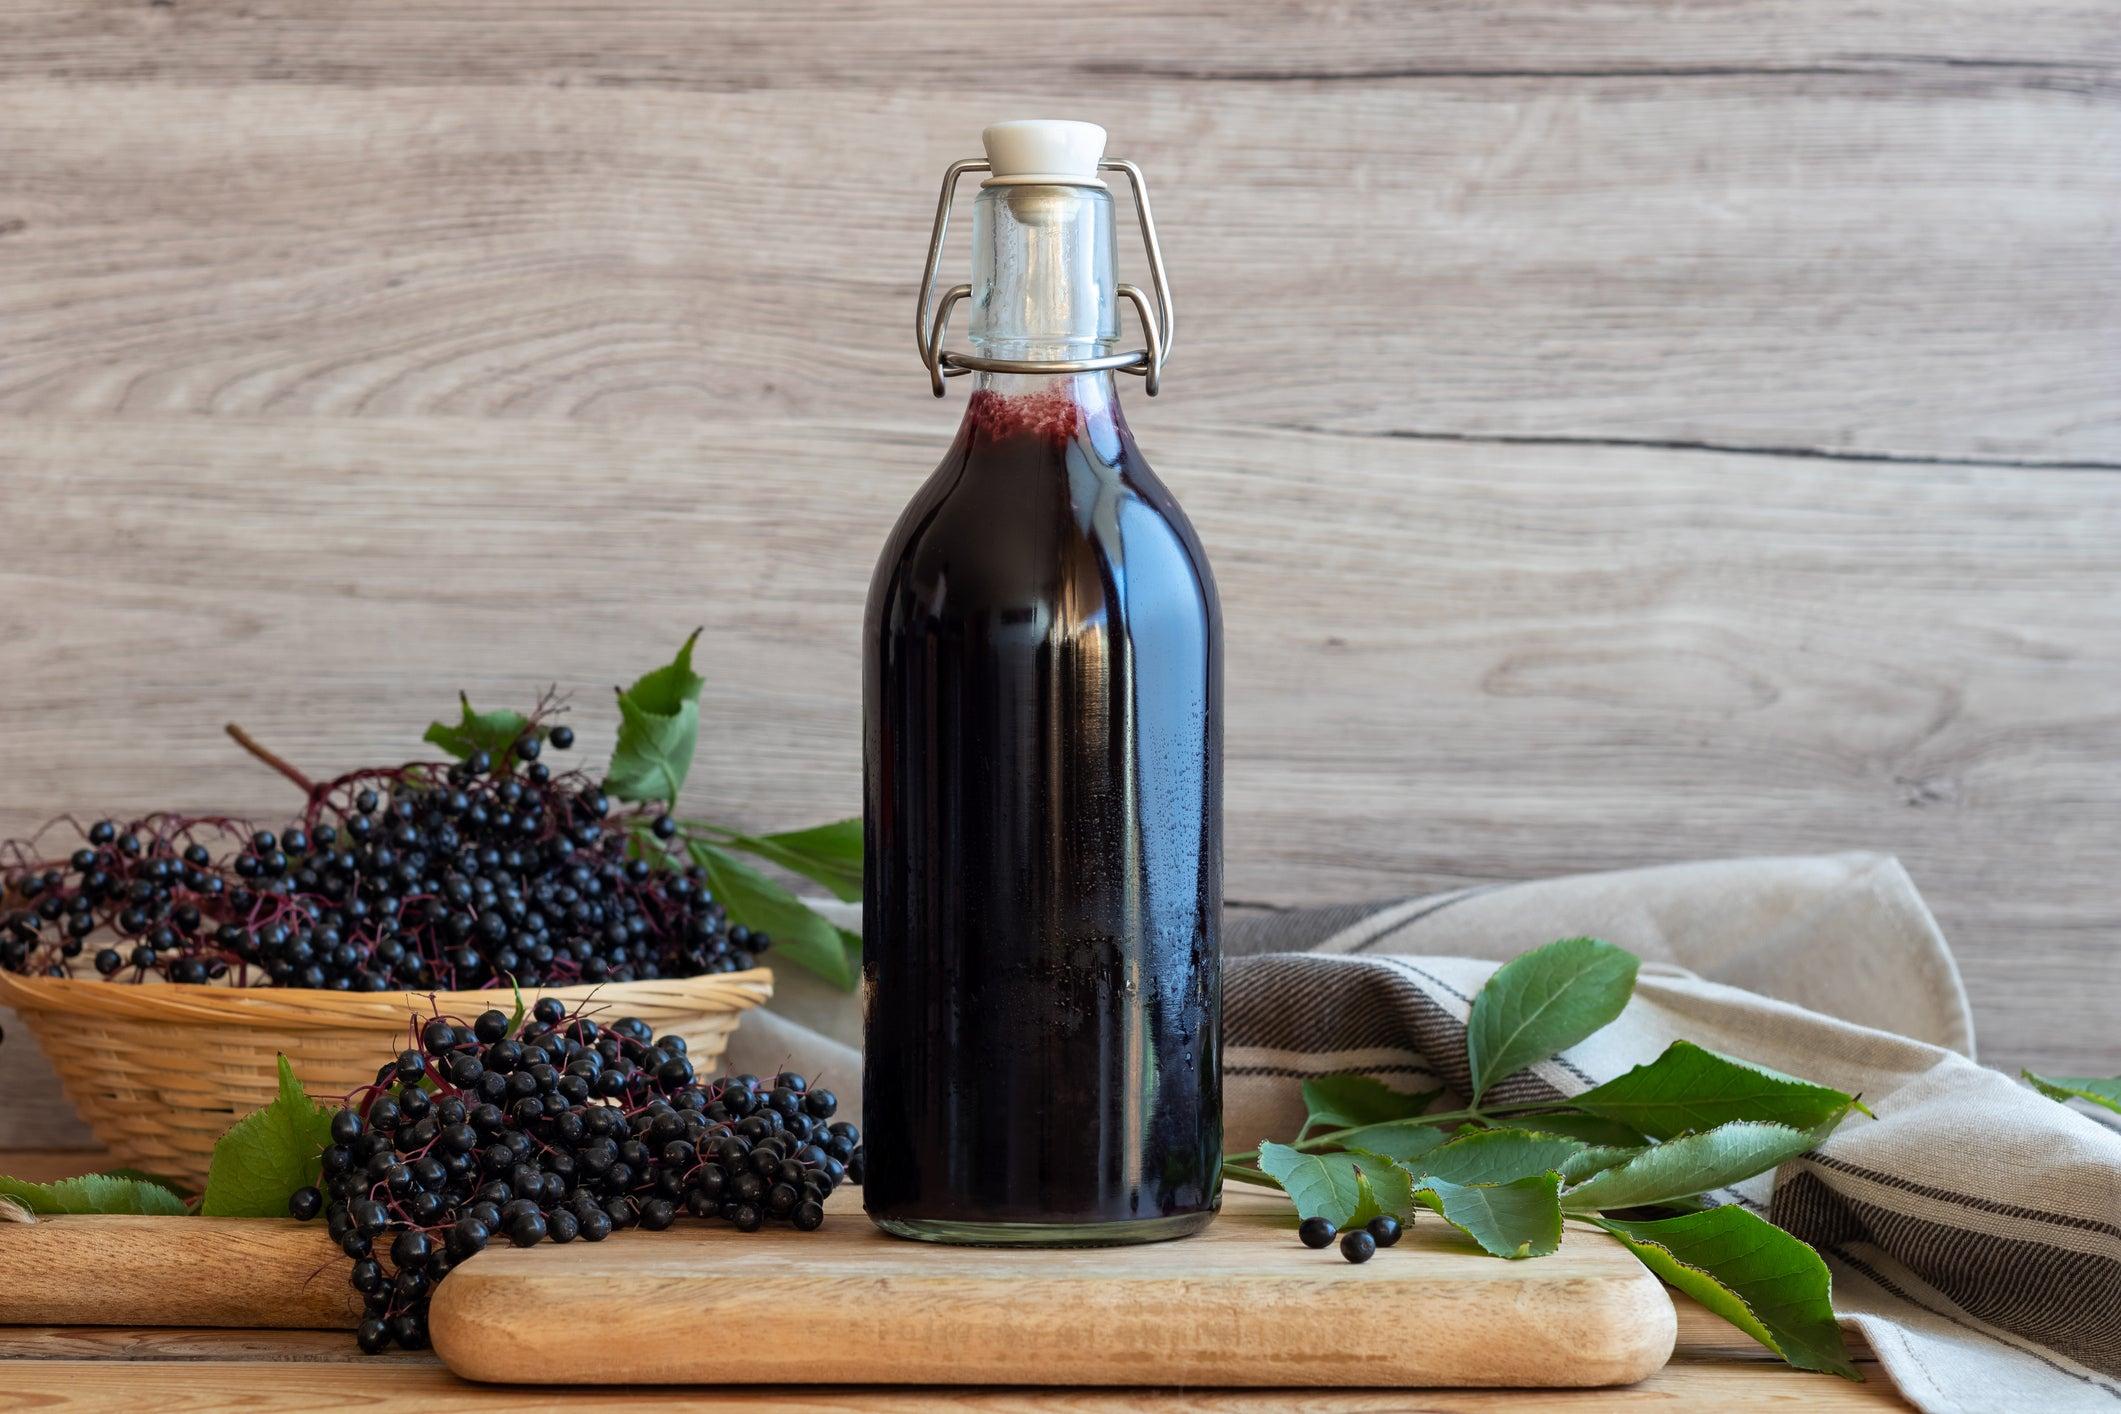 elderberries and homemade elderberry syrup